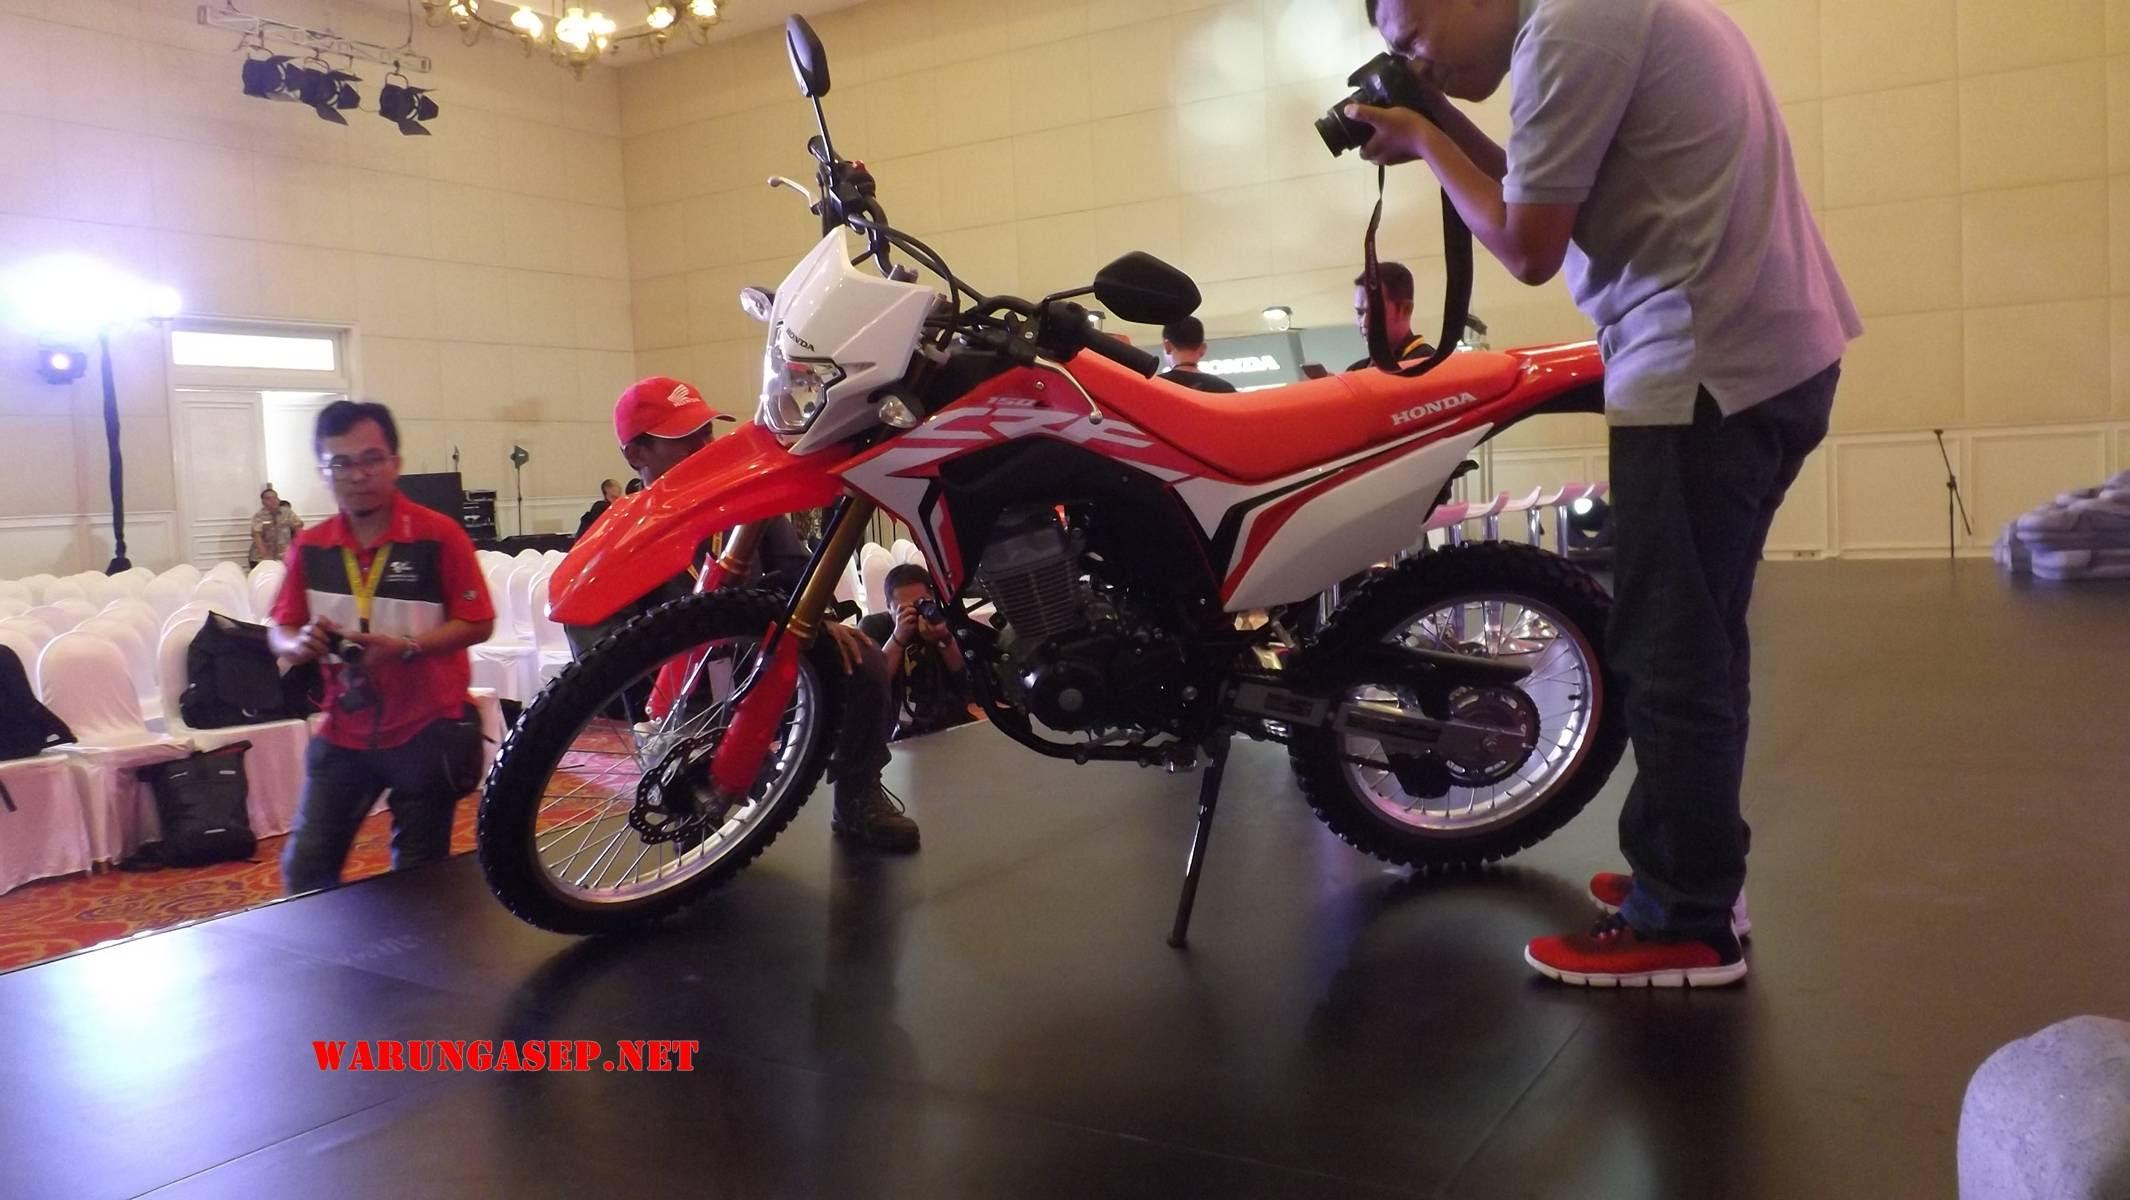 Honda Crf150l 2018 017 Warungasep WARUNGASEP